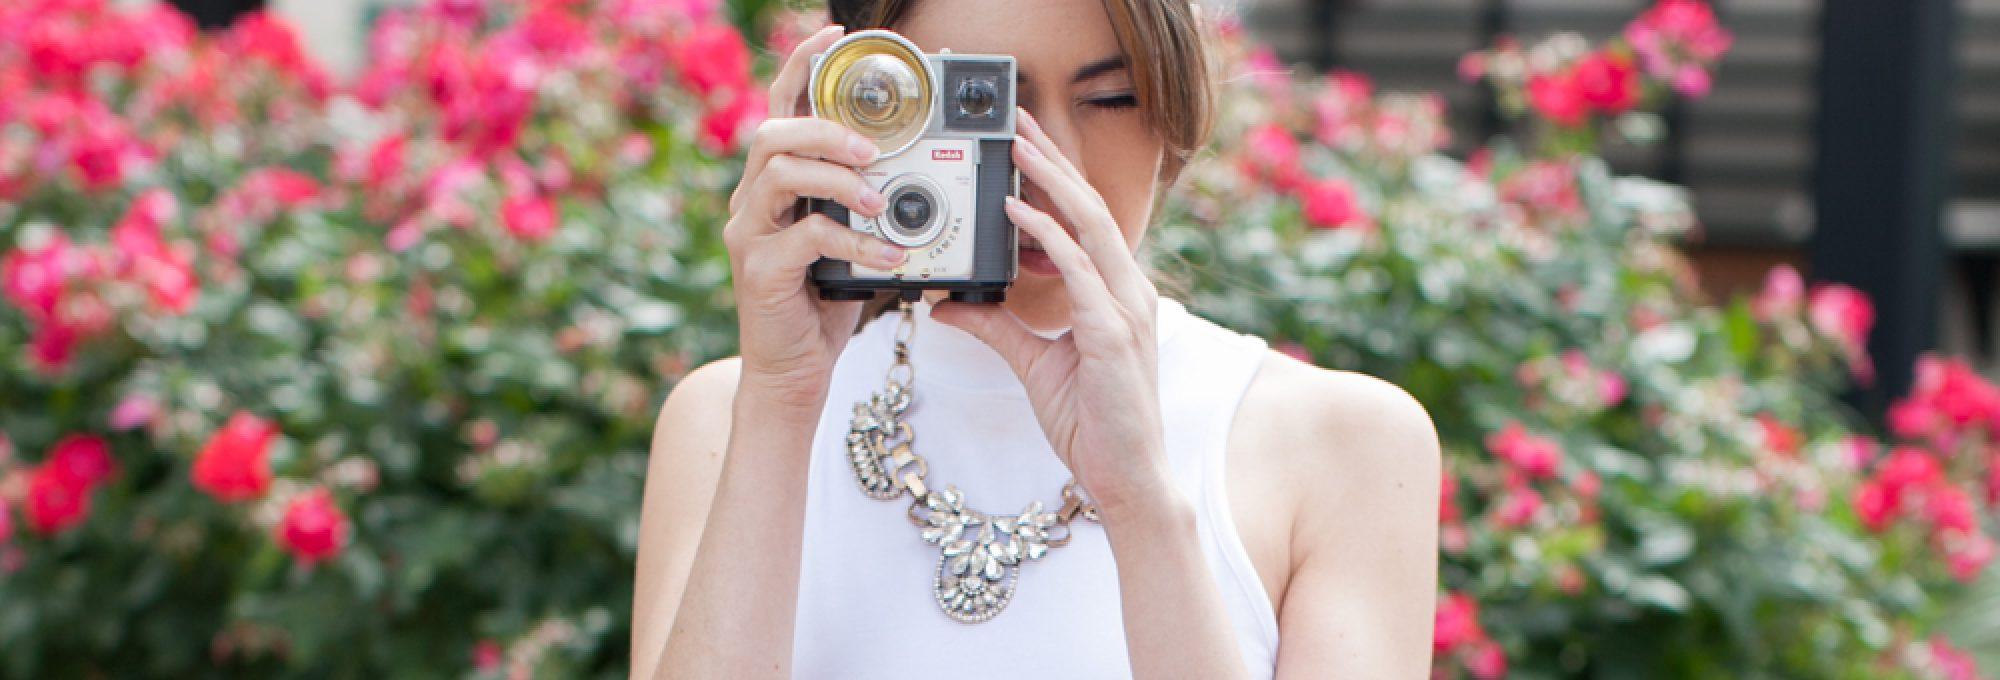 photography 101, blog photography, blogging tips, blog talk, johnny cheng photography